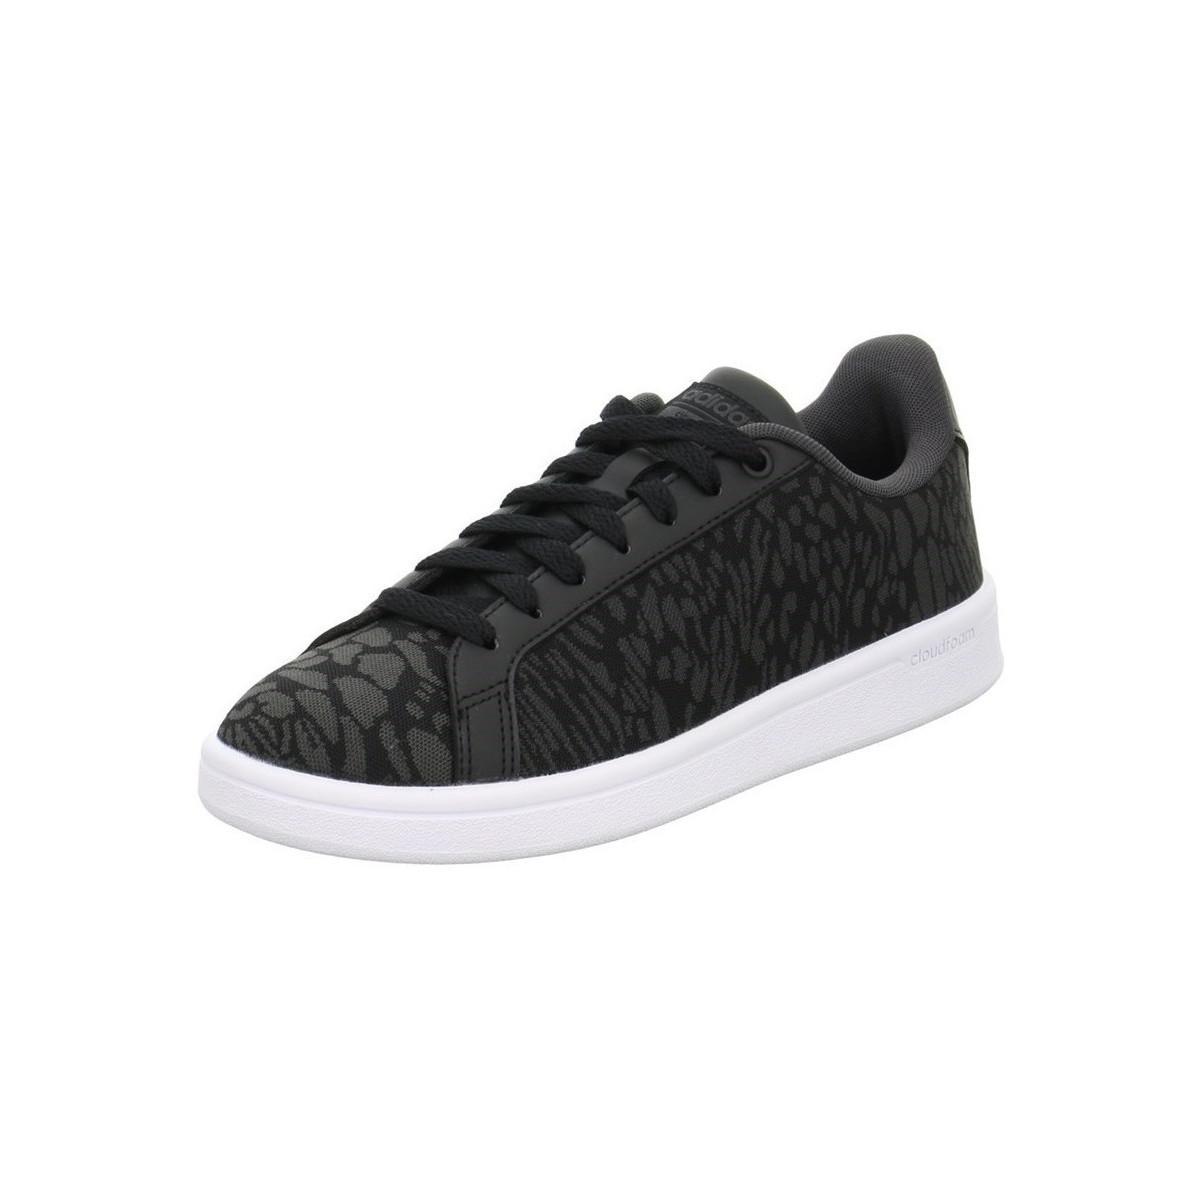 online store 61121 facf4 adidas. Cf Advantage Cl Damen ...